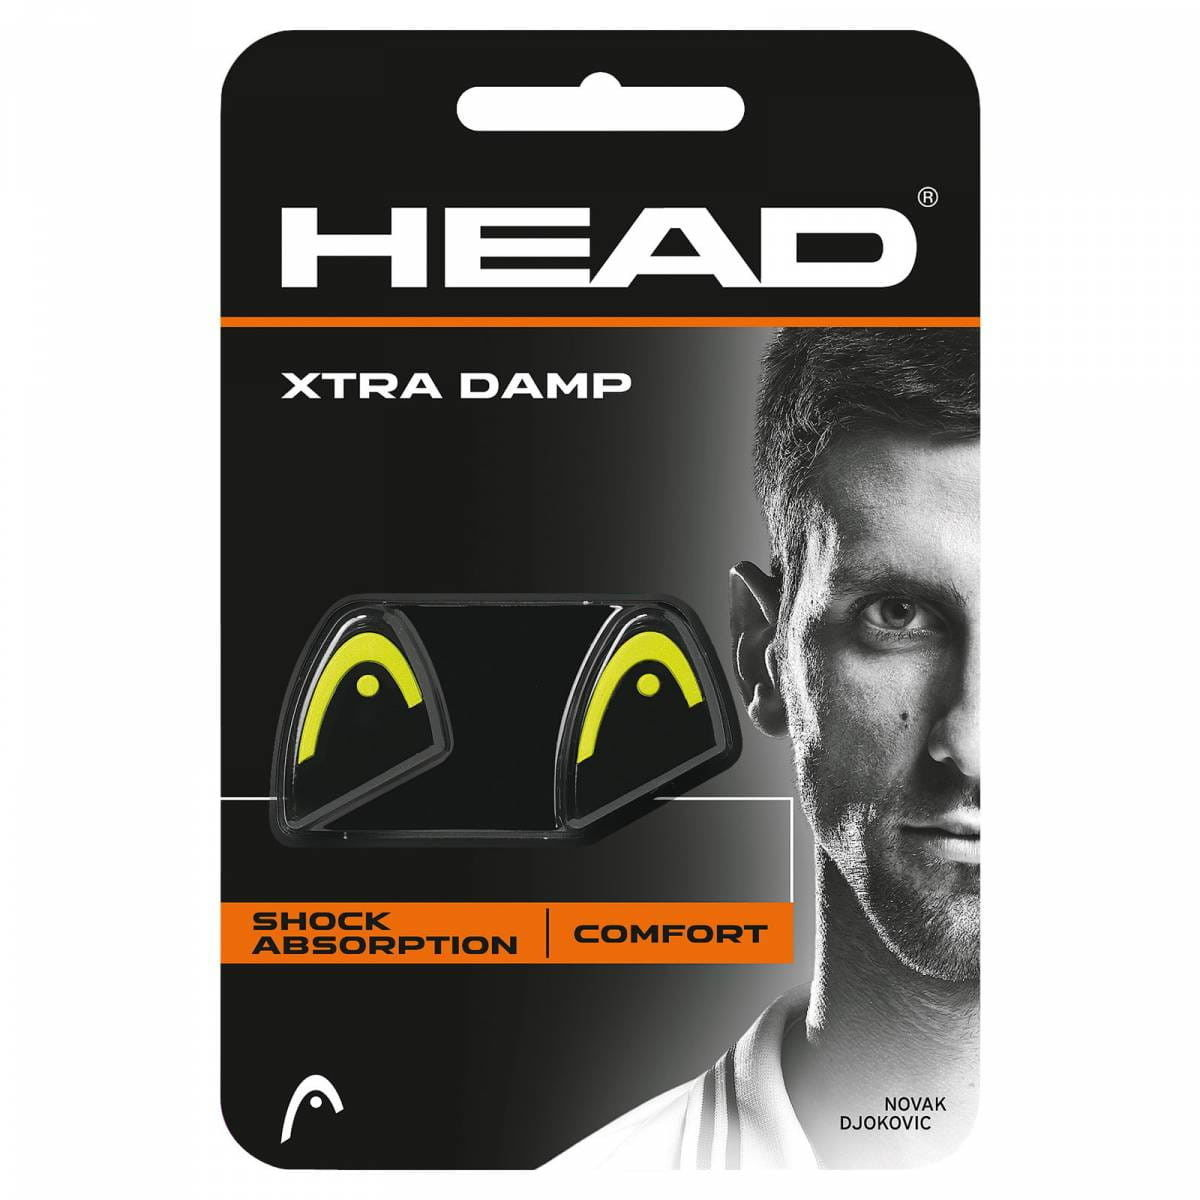 Head Xtra Damp - black/yellow 285511-YW